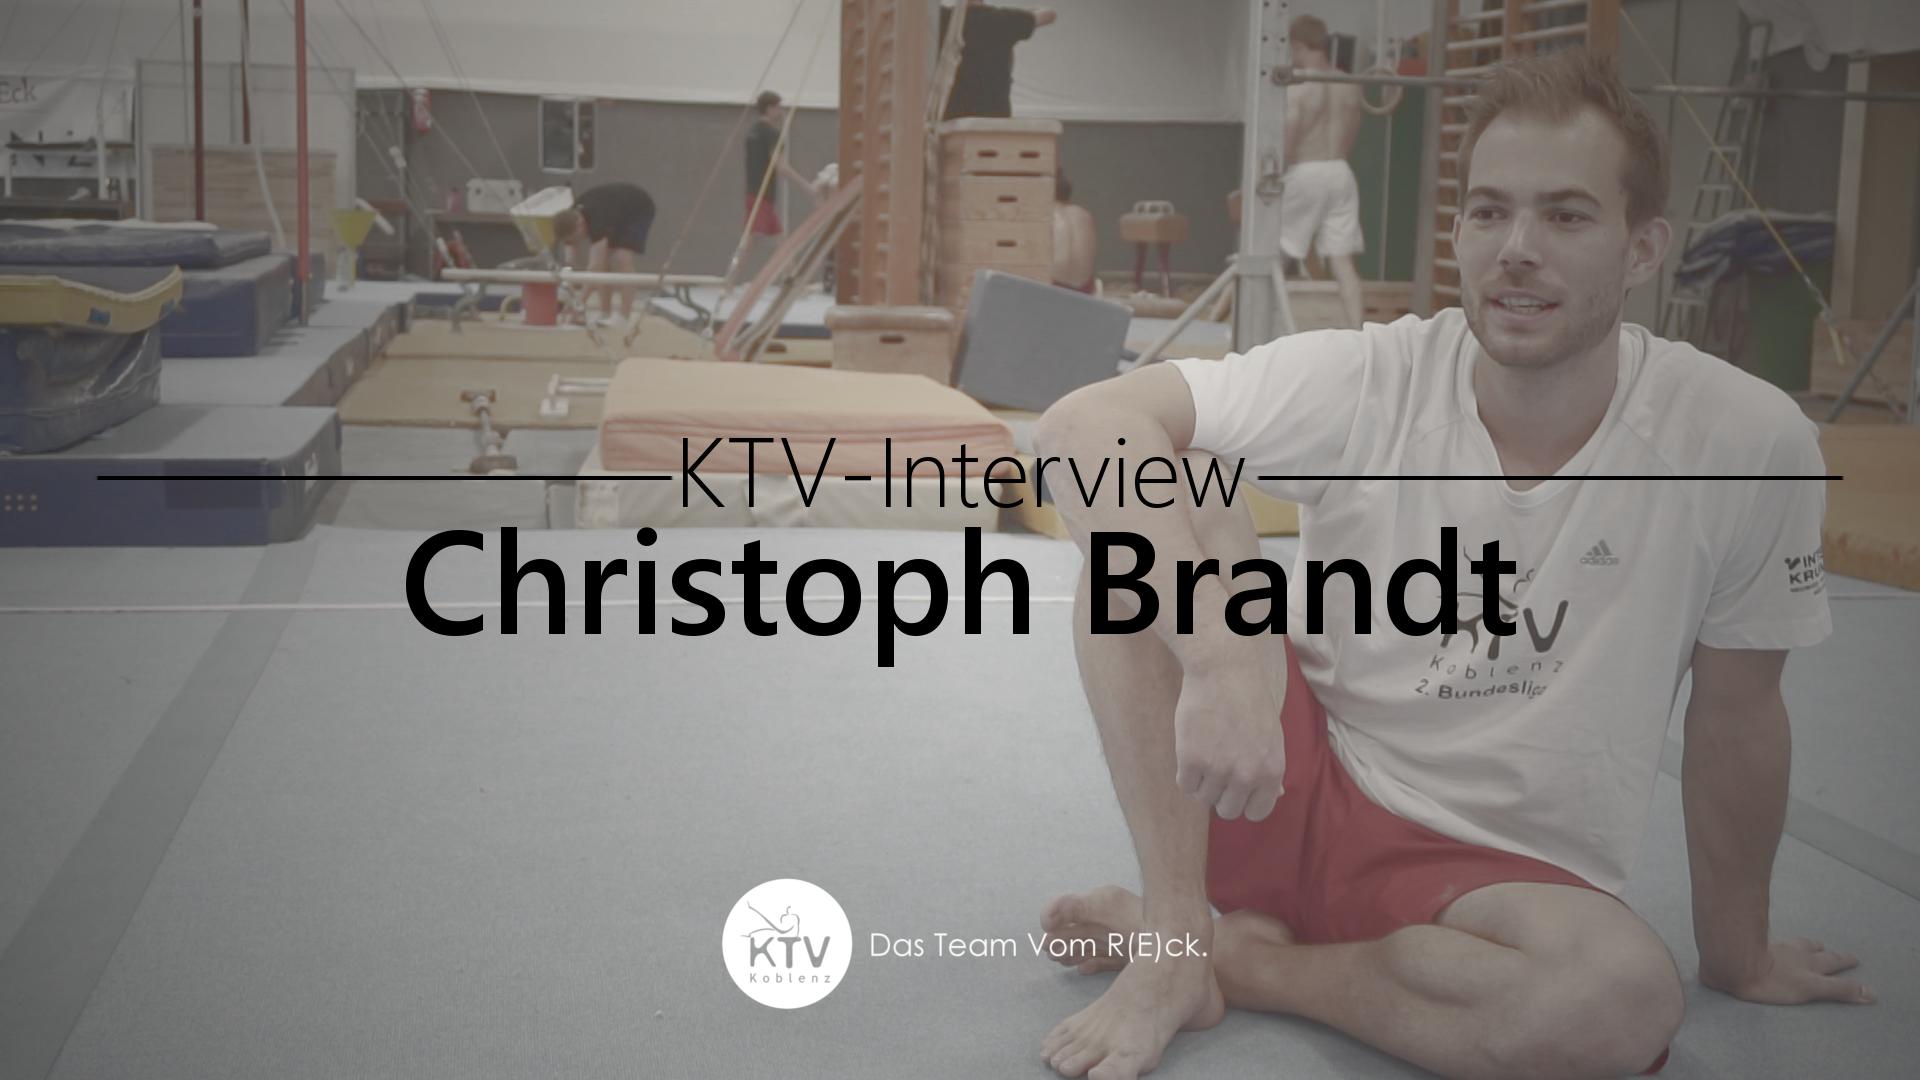 KTV-Interview   Christoph Brandt